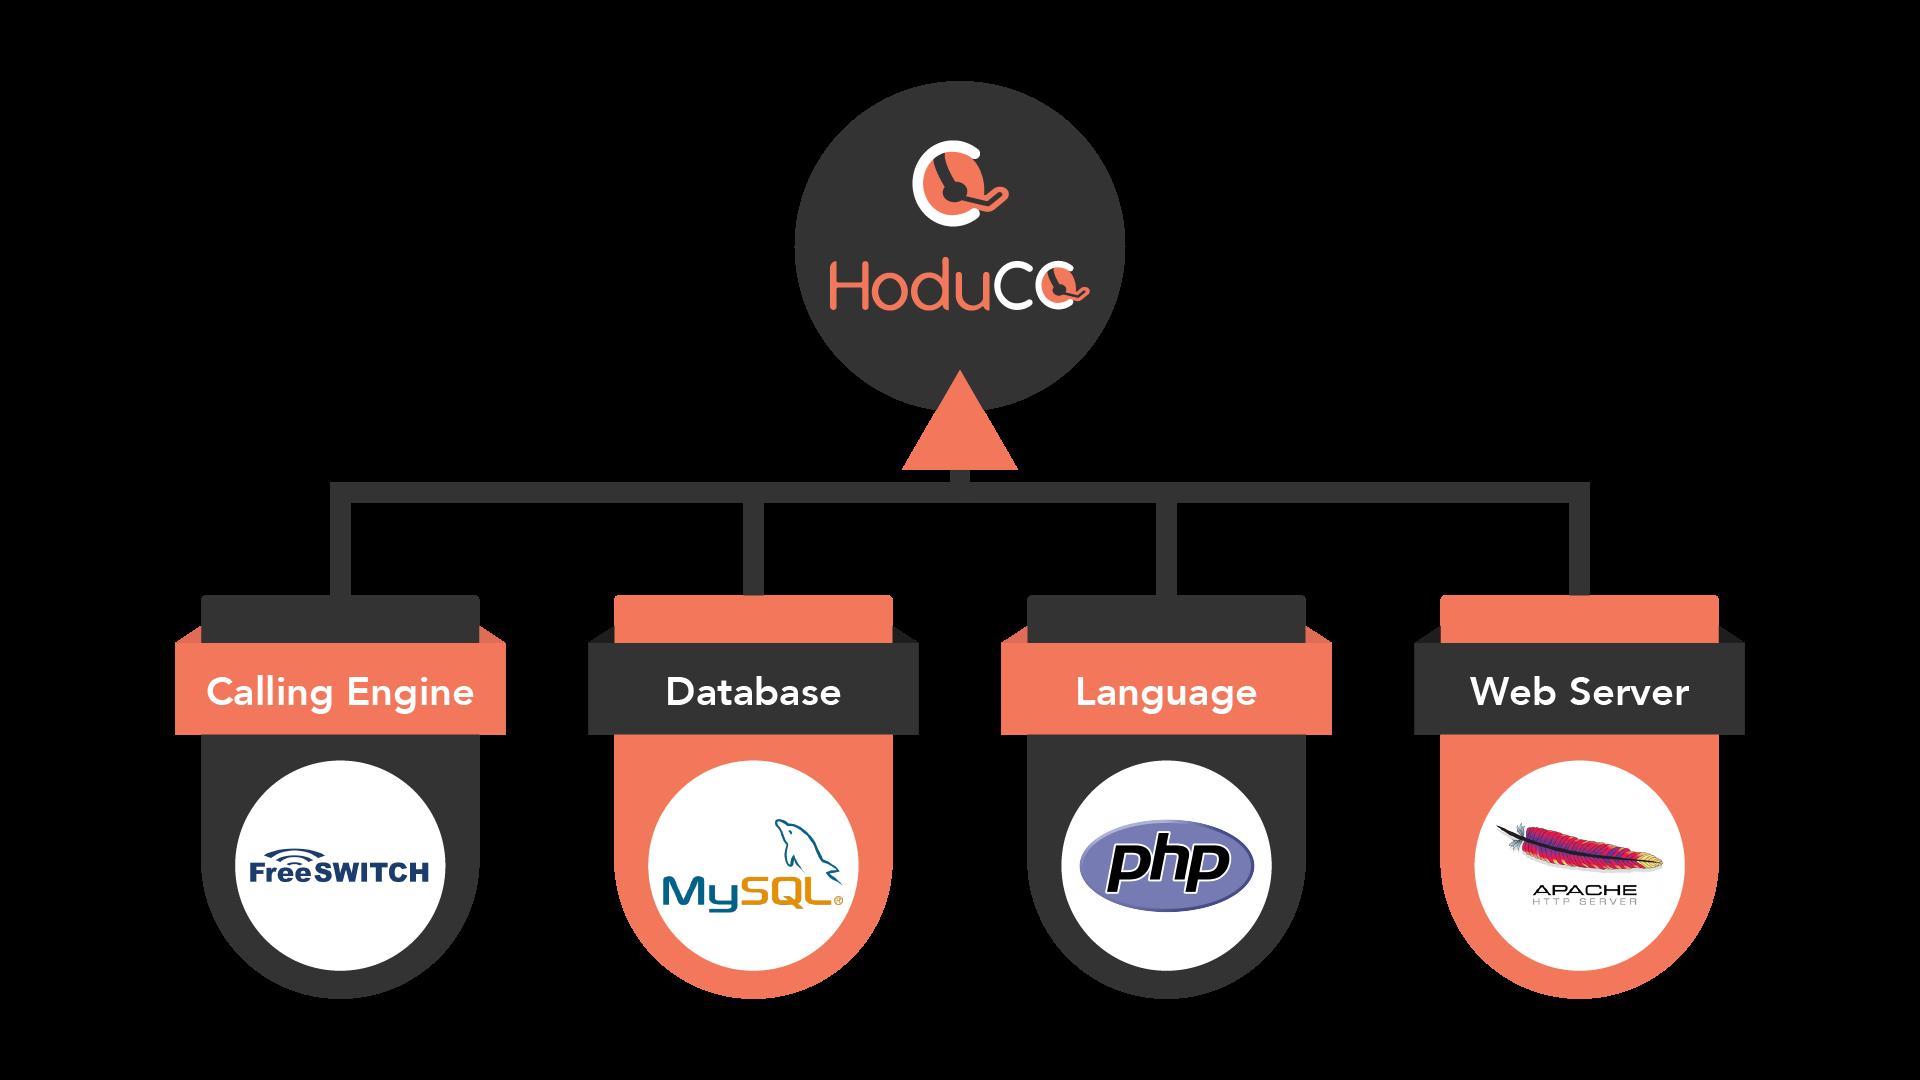 HoduCC Components